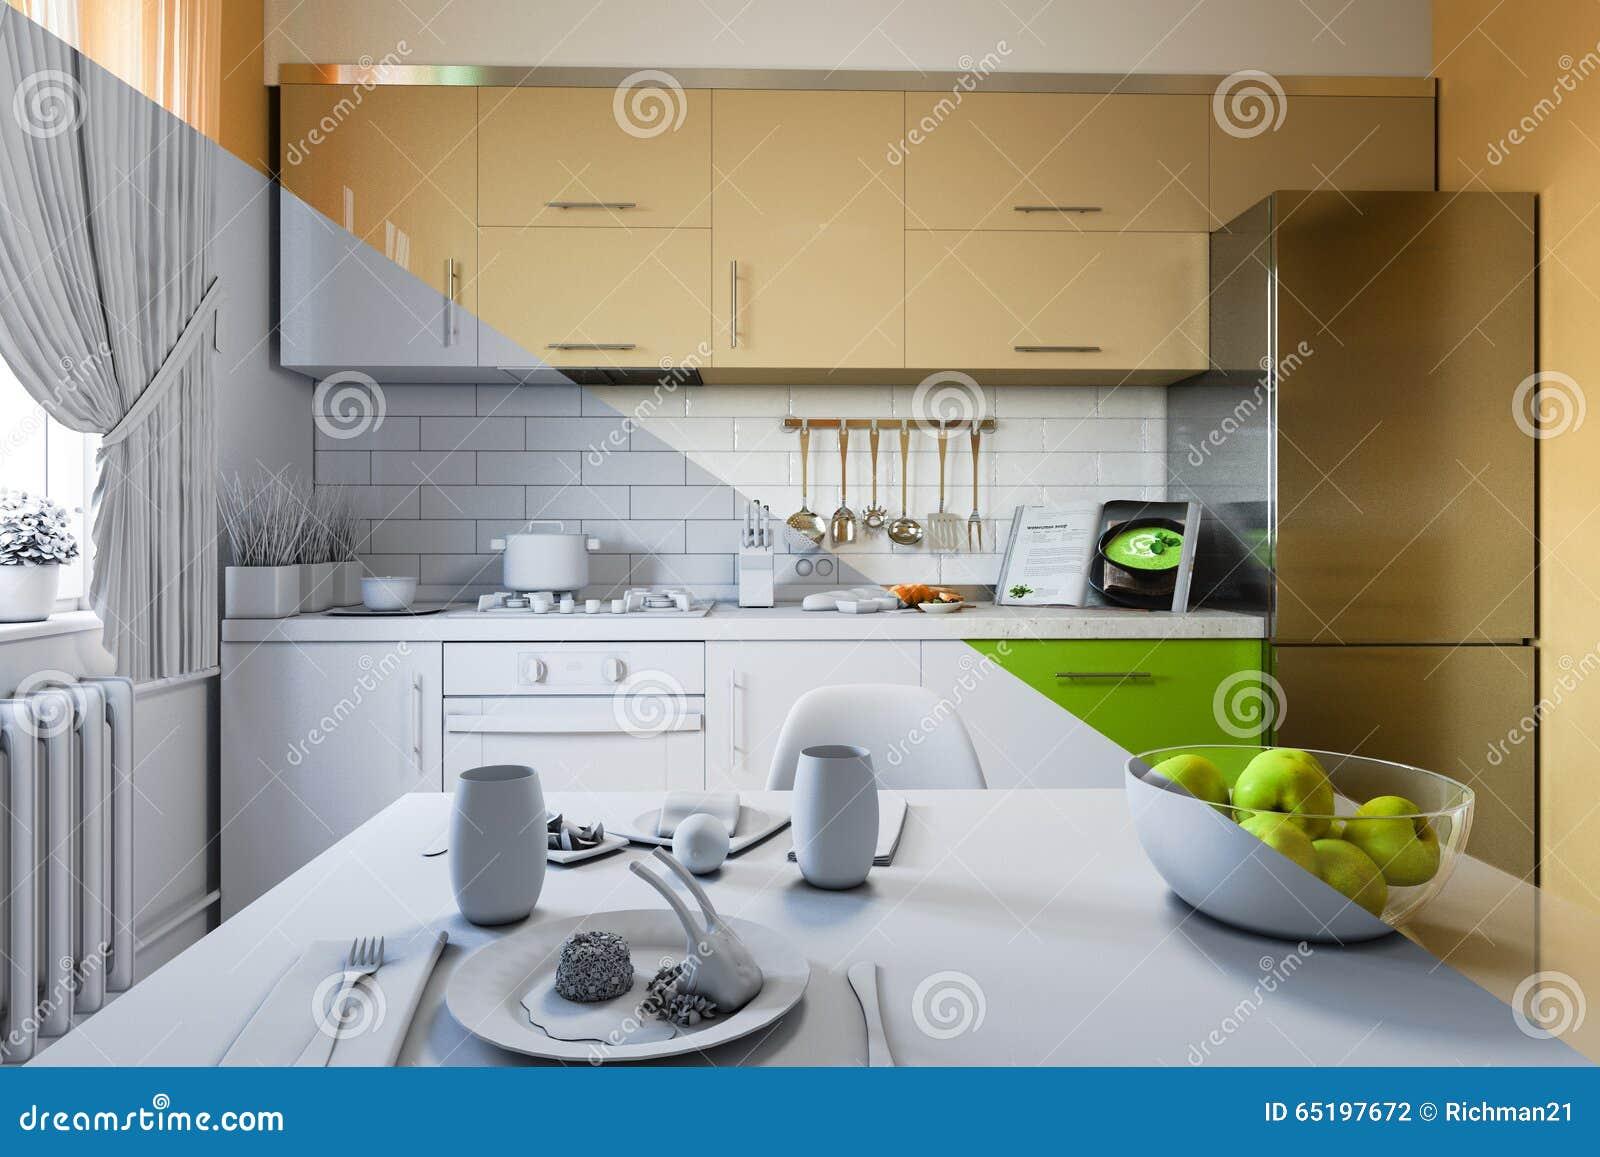 kitchen design free download 3d 3d render of kitchen design in a